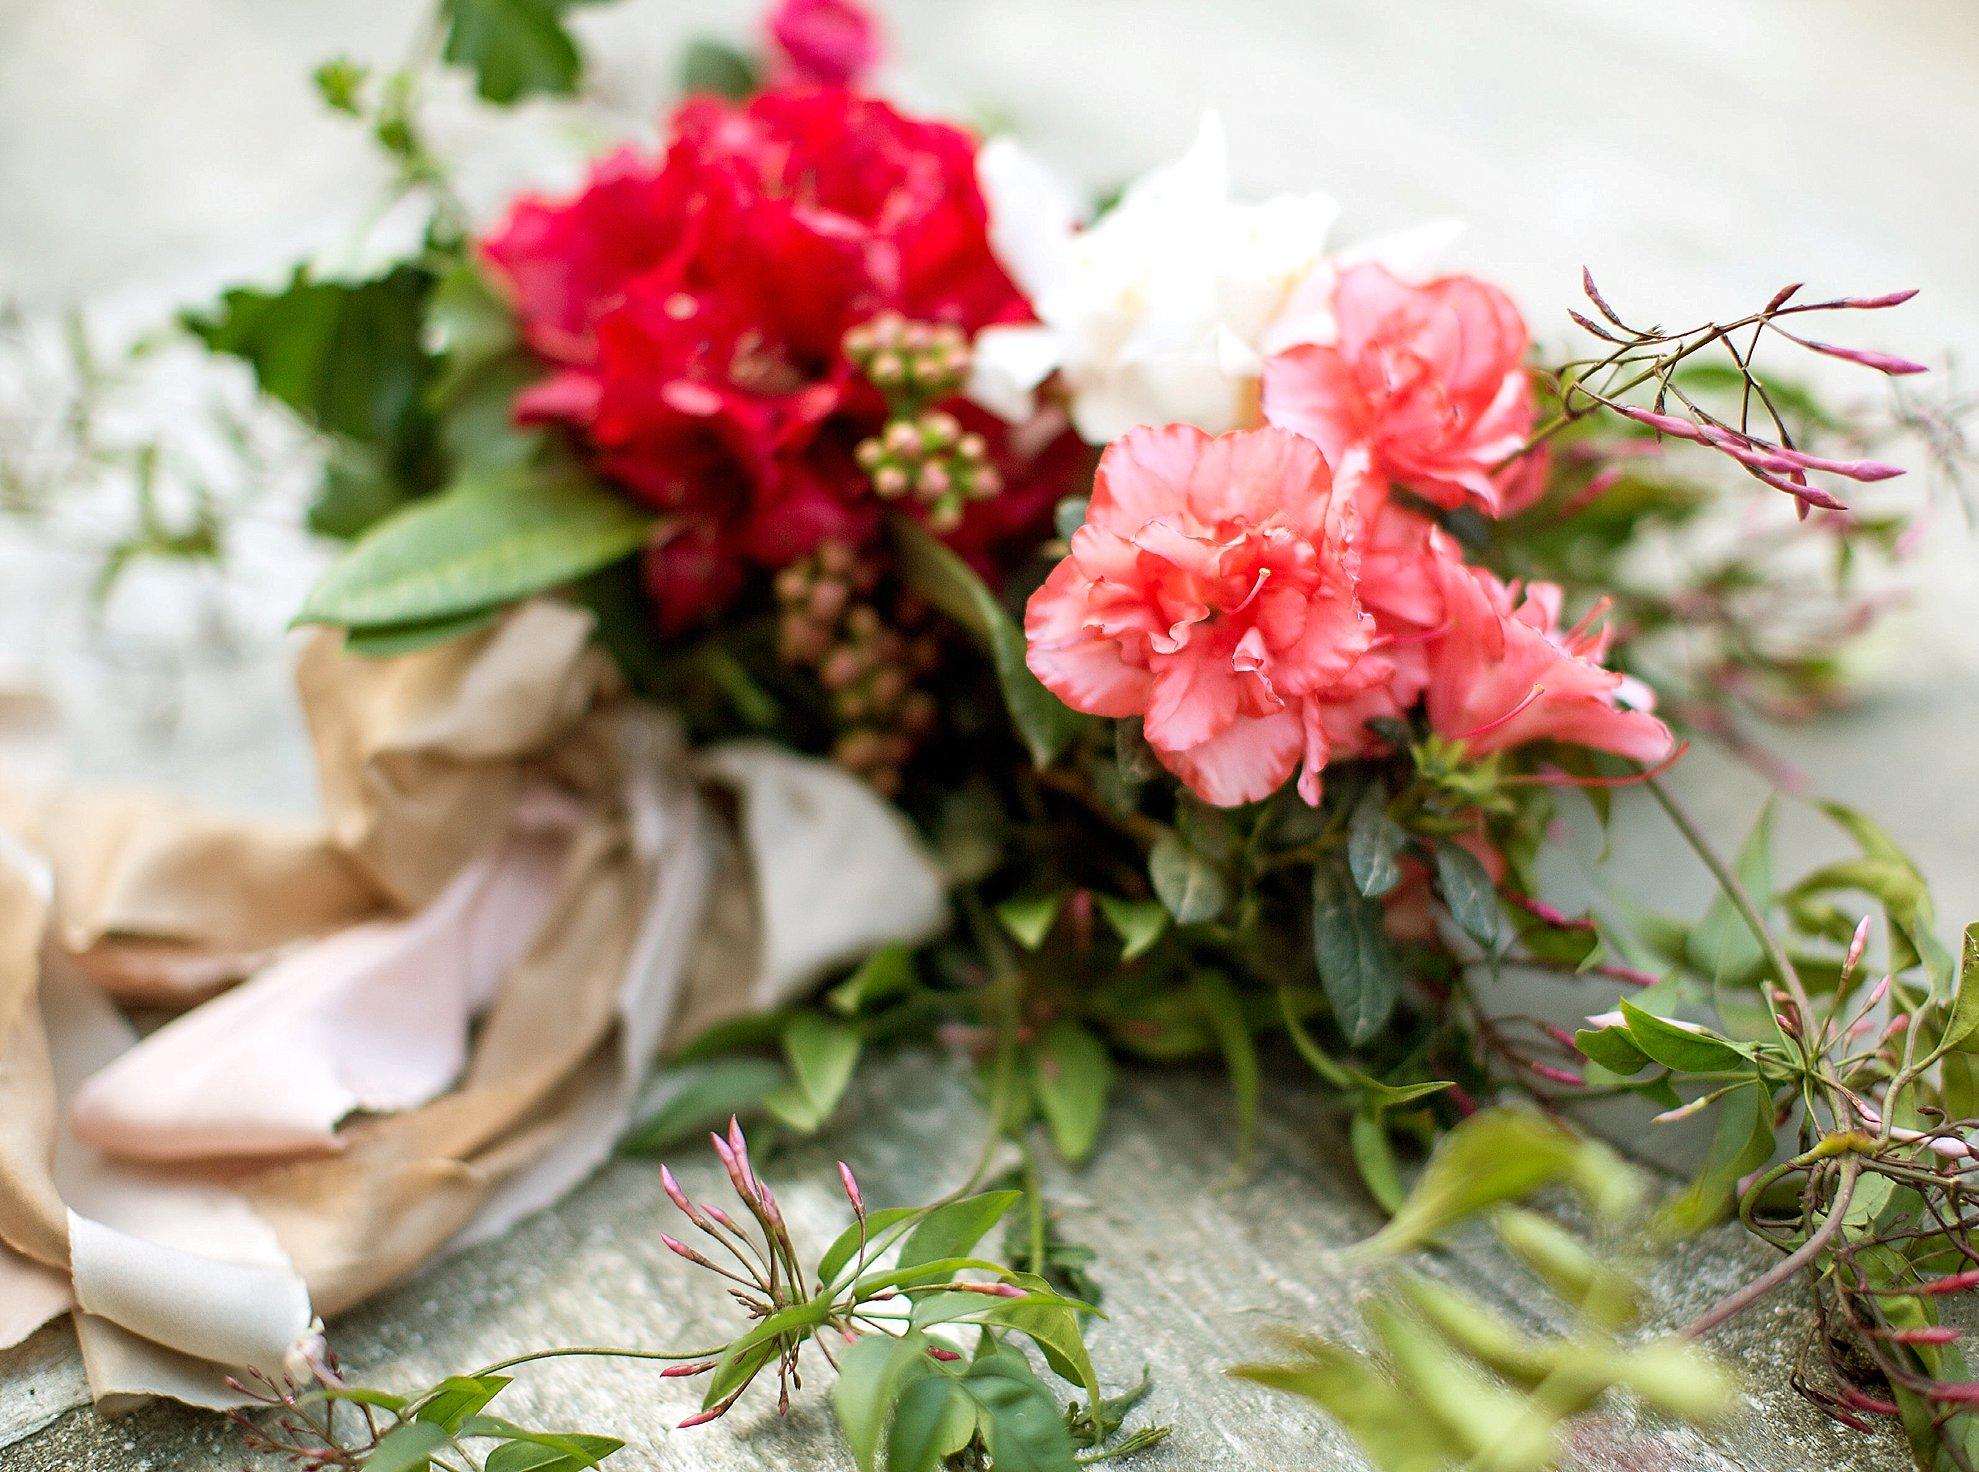 Bianca-Rijkenbarg-fotografie-for-this-romance-bruidsinspiratie-blog_0011